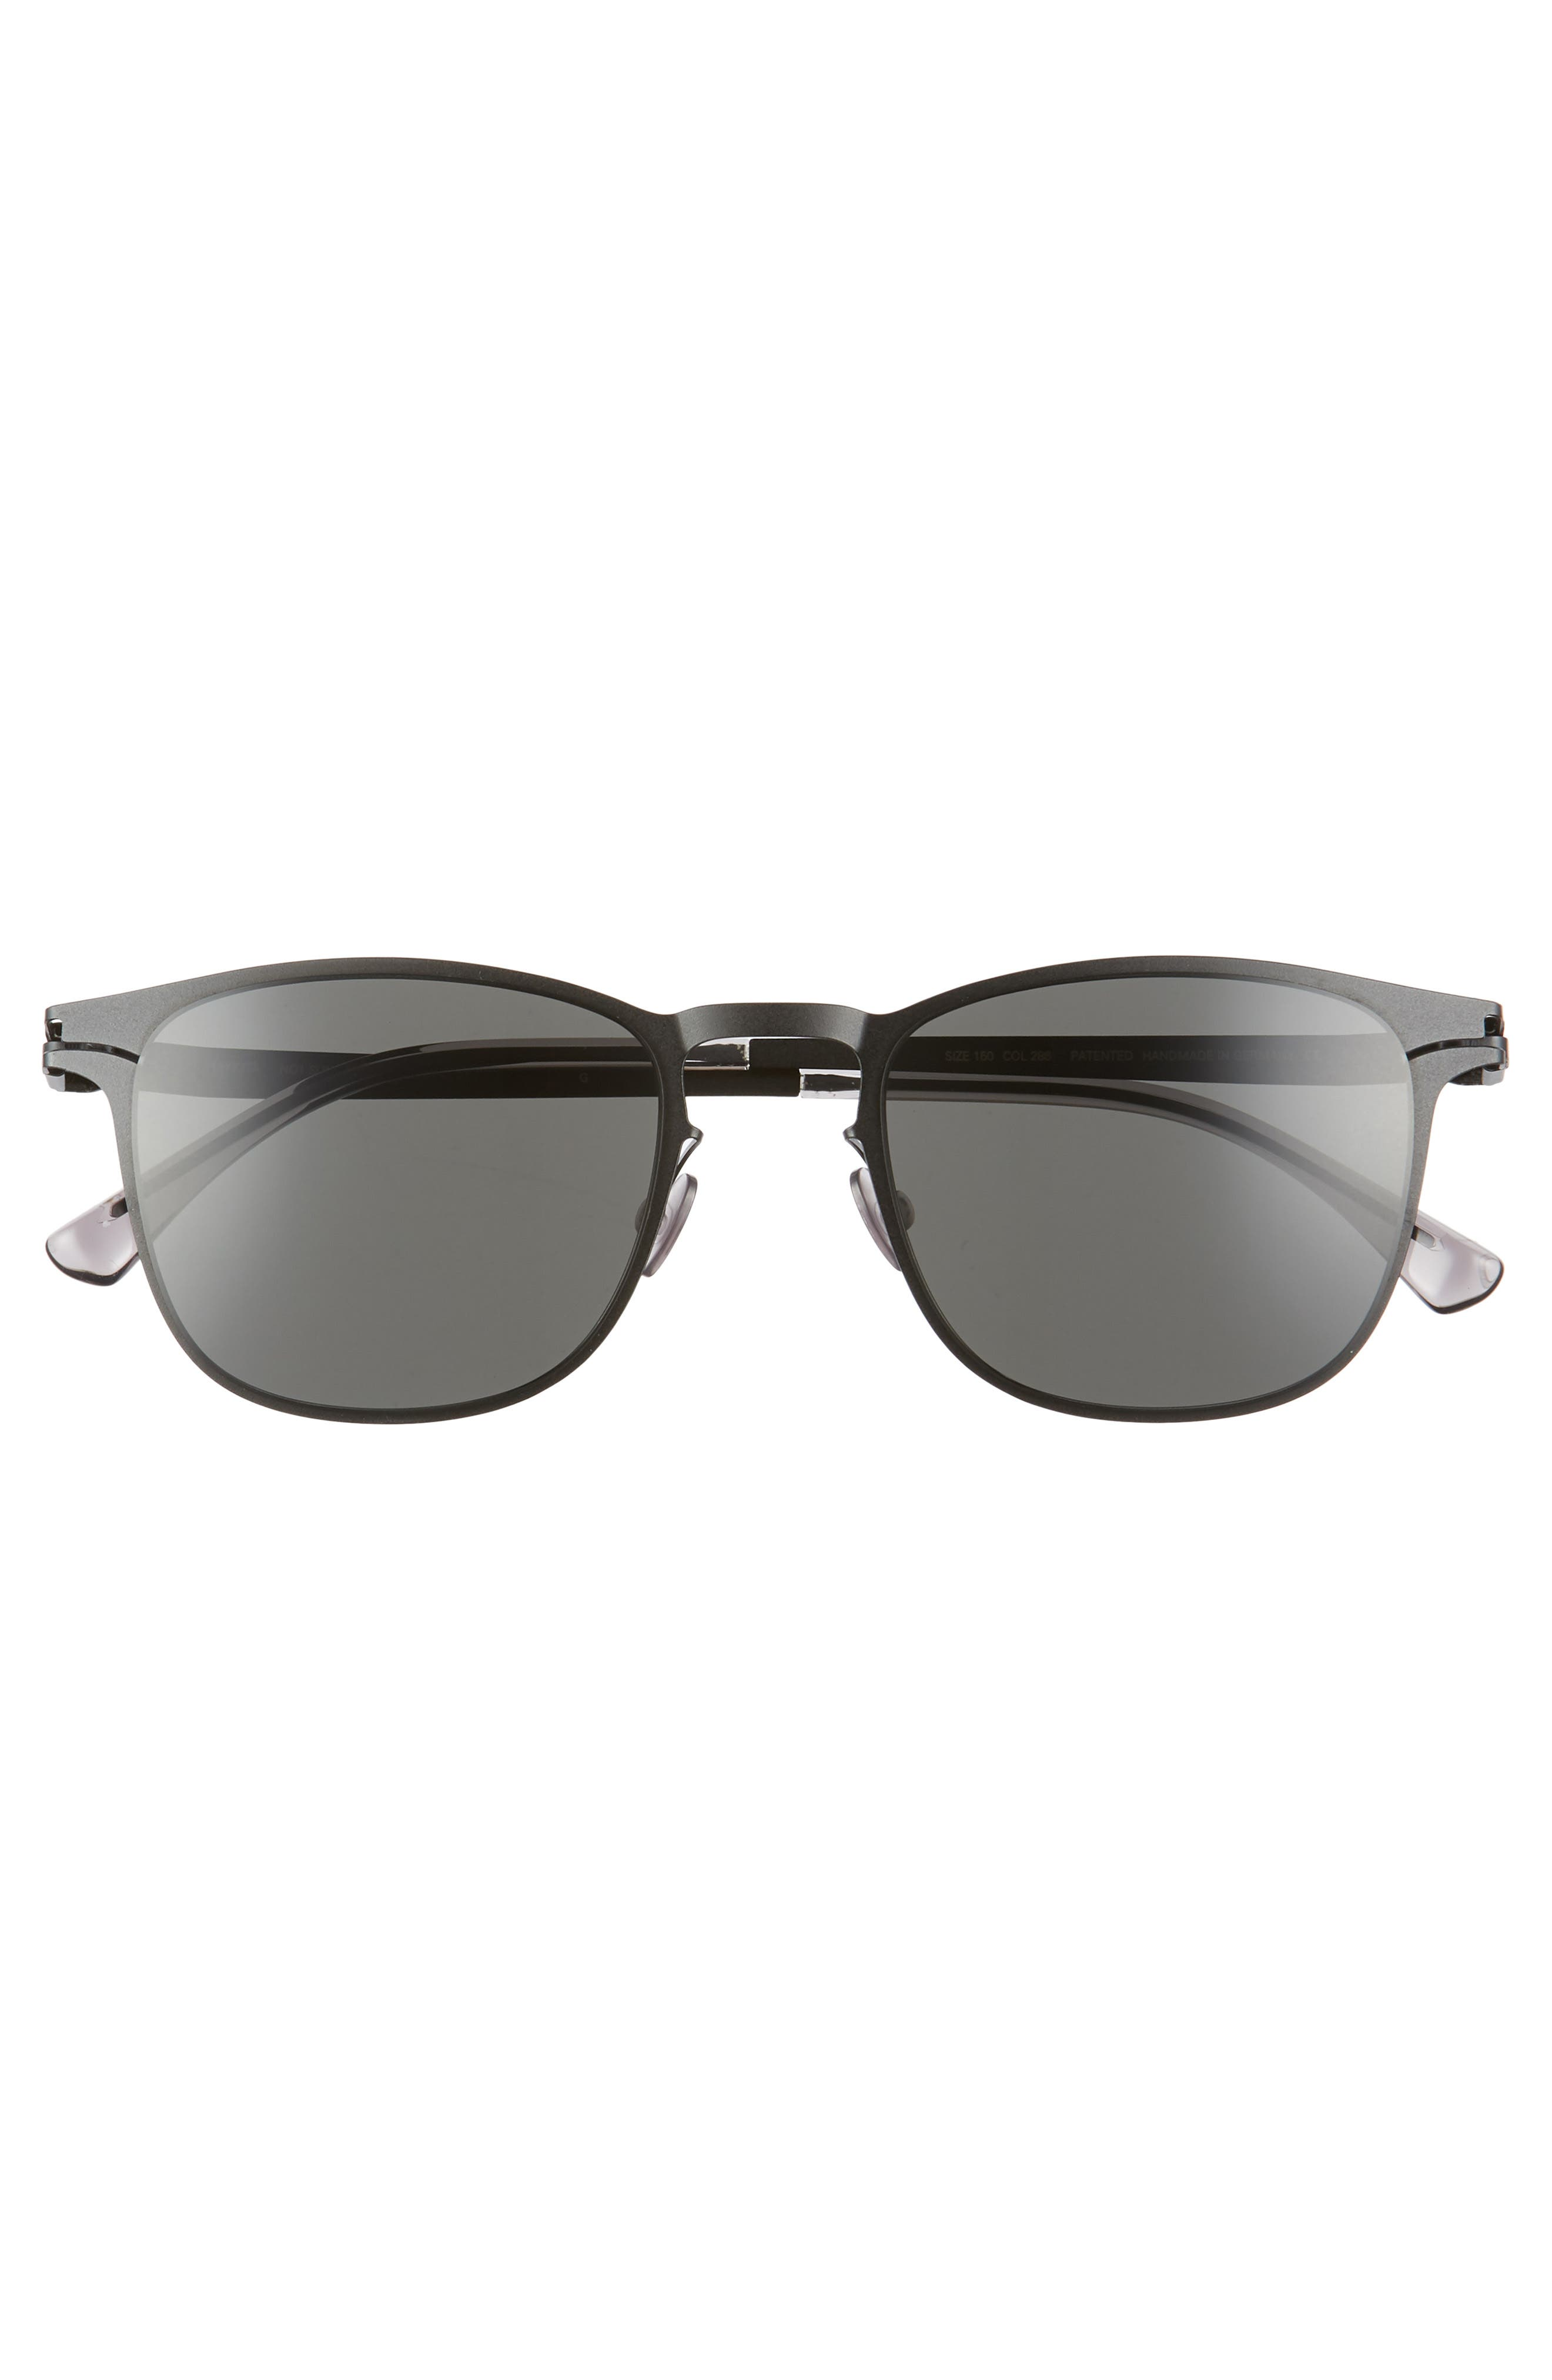 Riccardo 51mm Sunglasses,                             Alternate thumbnail 2, color,